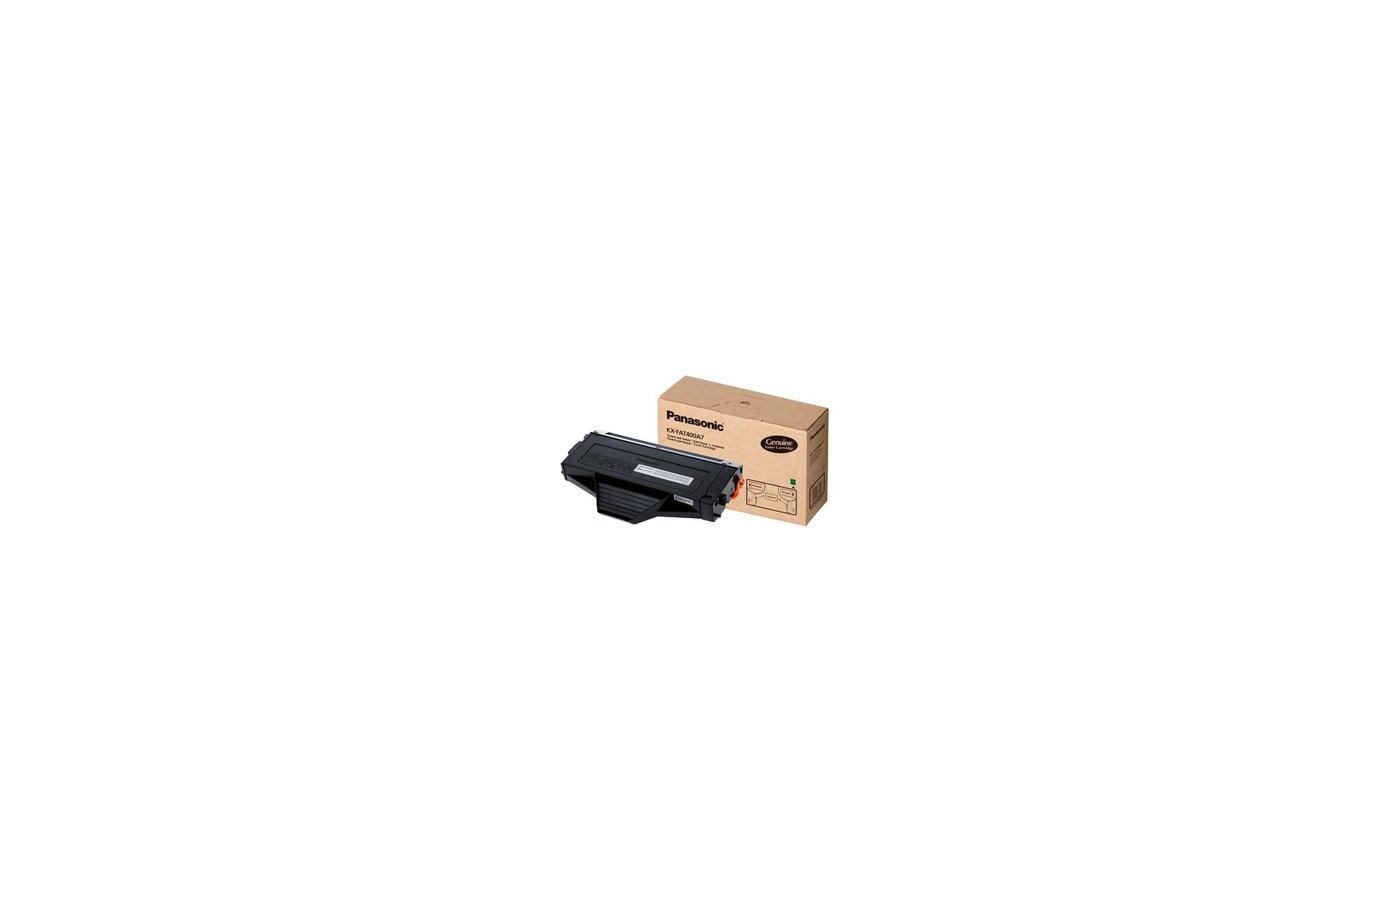 Картридж лазерный Panasonic KX-FAT400A для KX-MB1500/1520RU (1 800 стр)